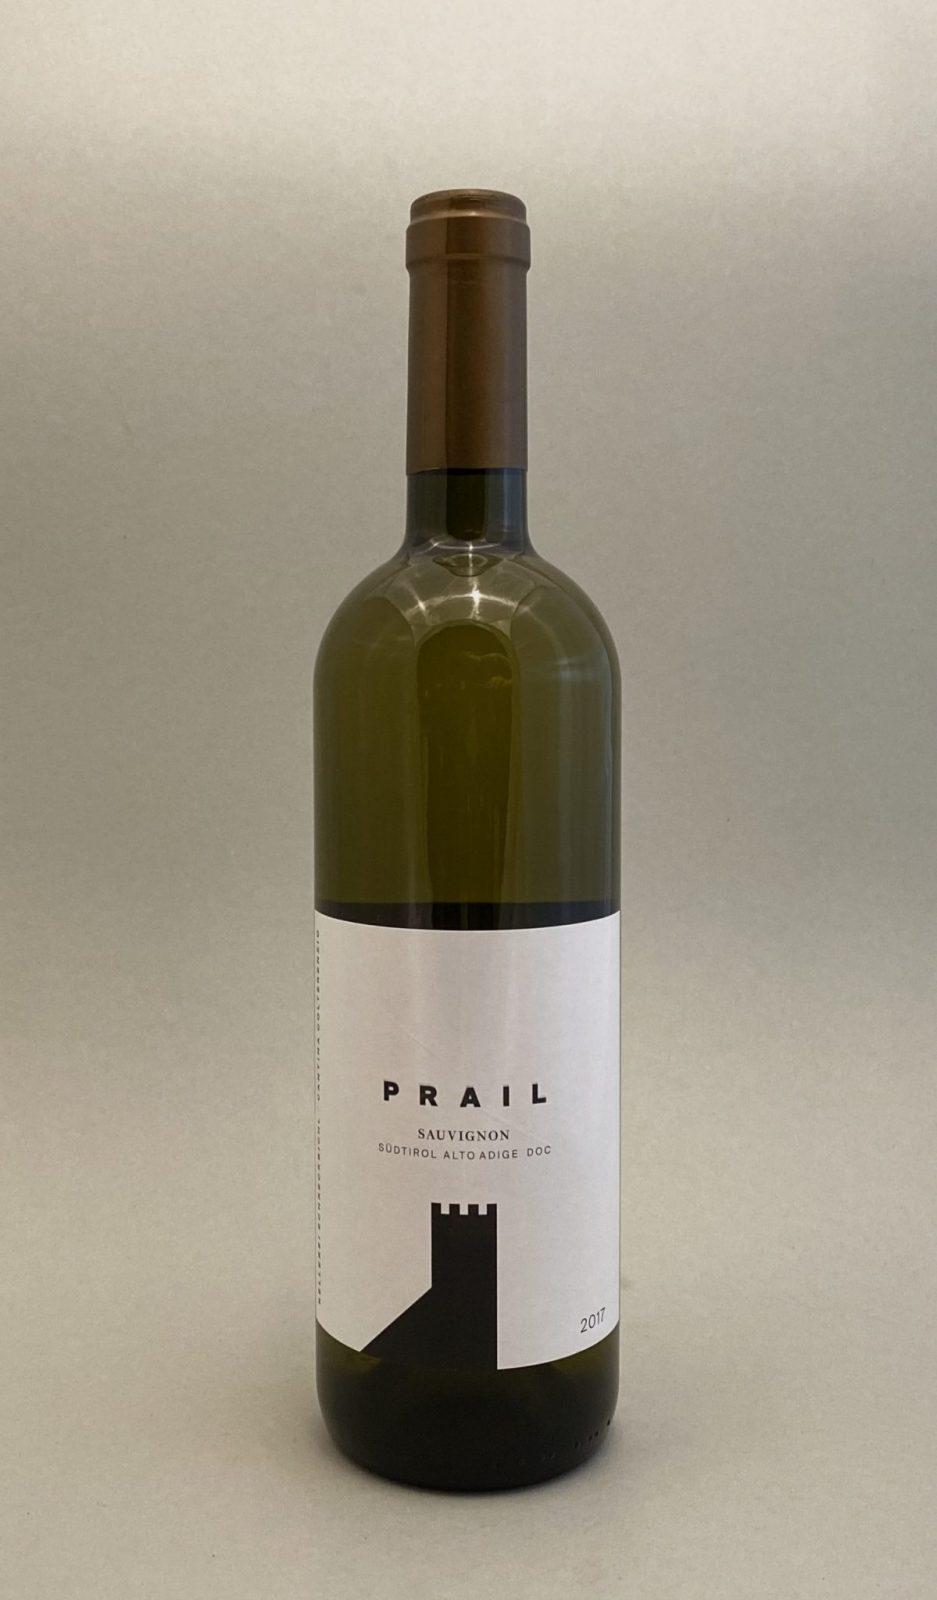 COLTERENZIO Prail Sauvignon 2017, vinoteka Sunny wines slnecnice mesto, Bratislava petrzalka, vino biele z Talianska